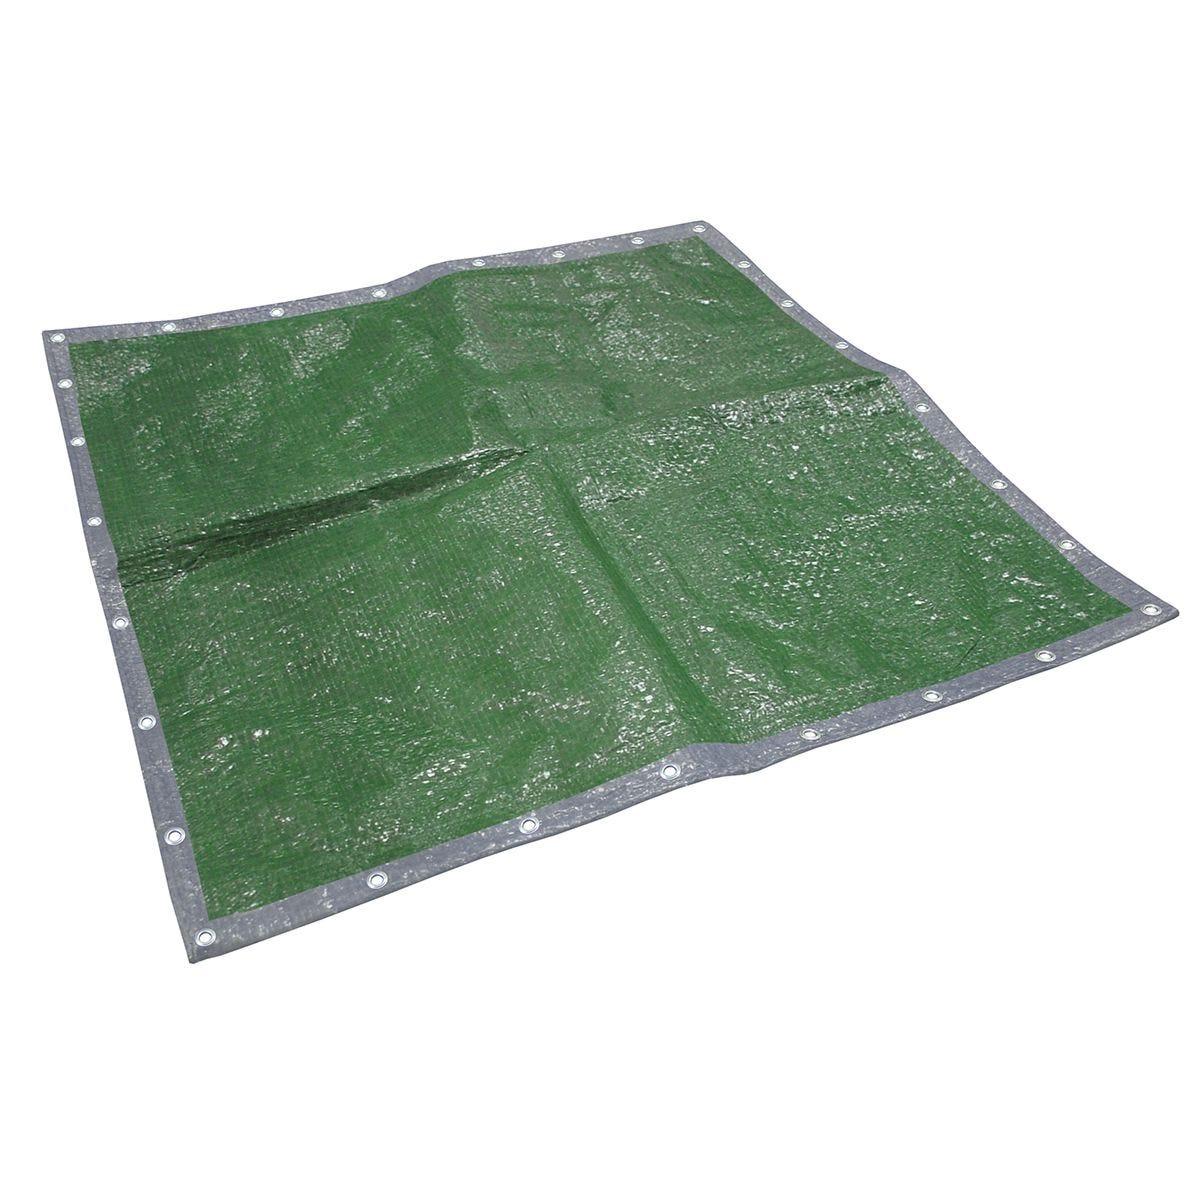 Faithfull Tarpaulin Green / Silver 5.4 x 3.6m (18 x 12ft)